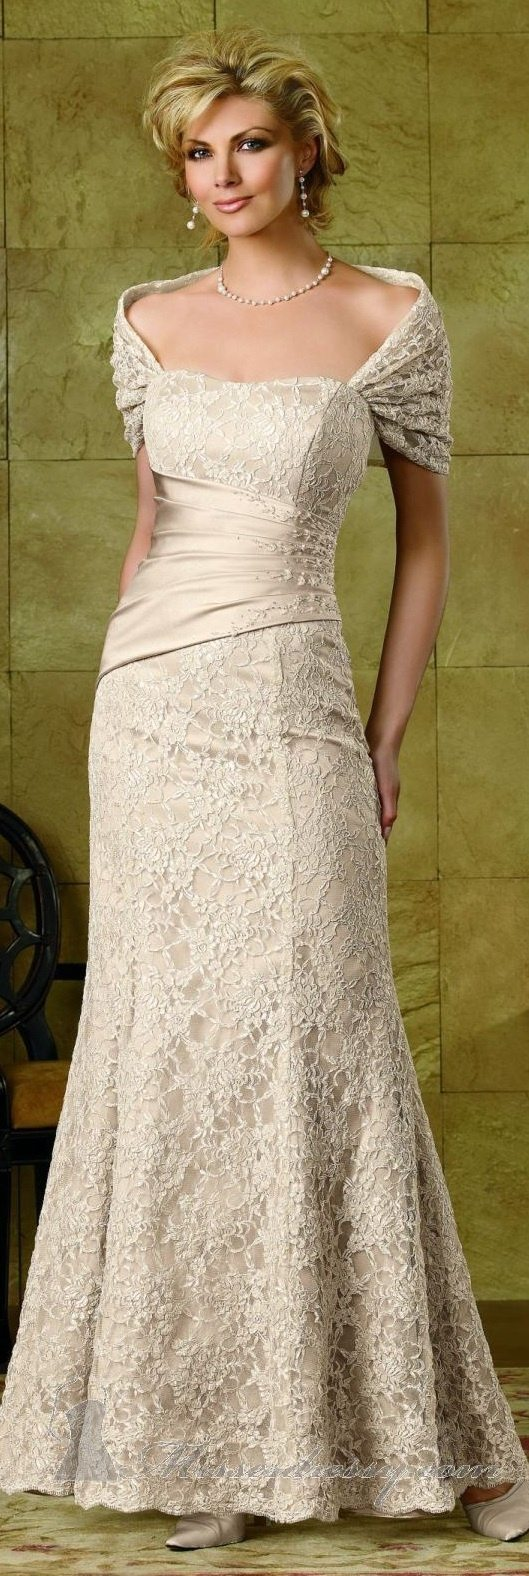 wedding dresses older brides | | IDoTakeTwo.com